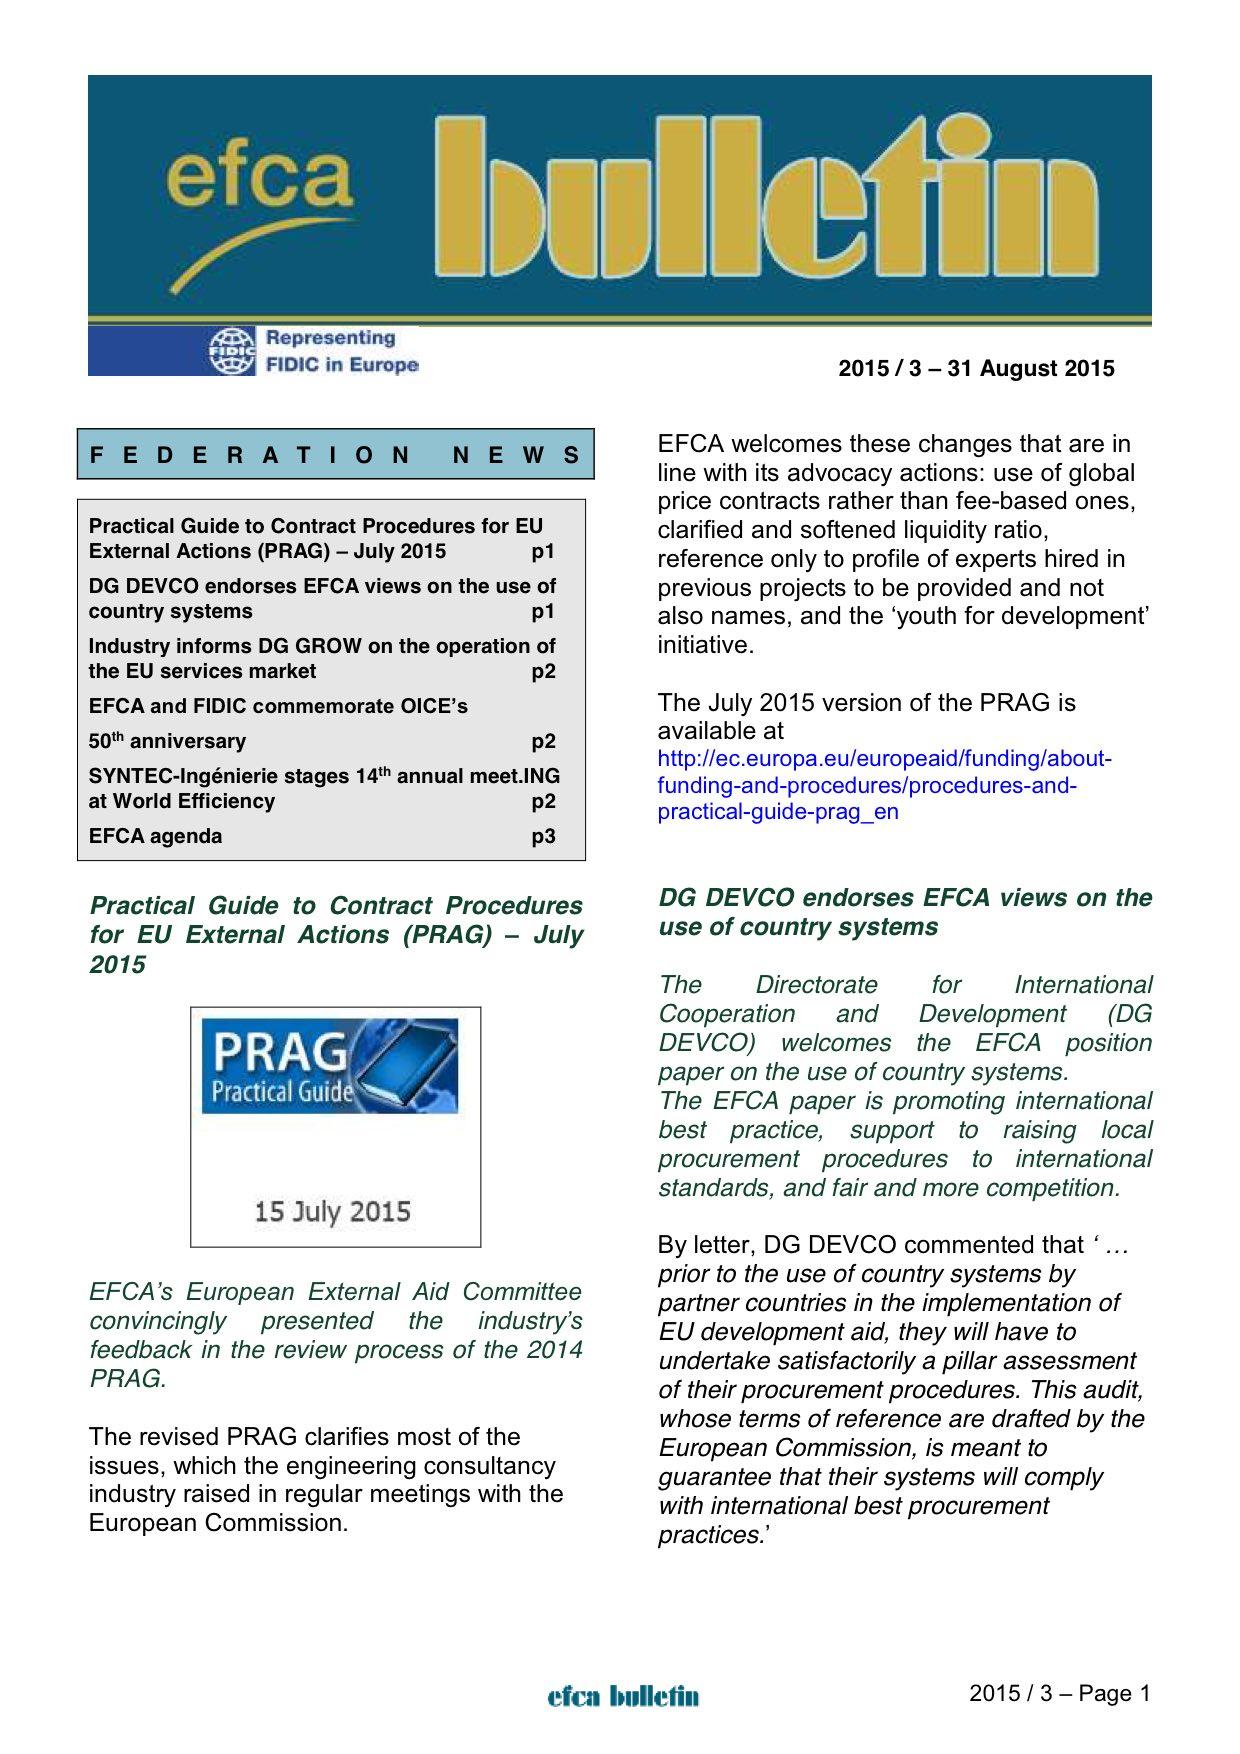 biuletyn-efca-3-2015-p1